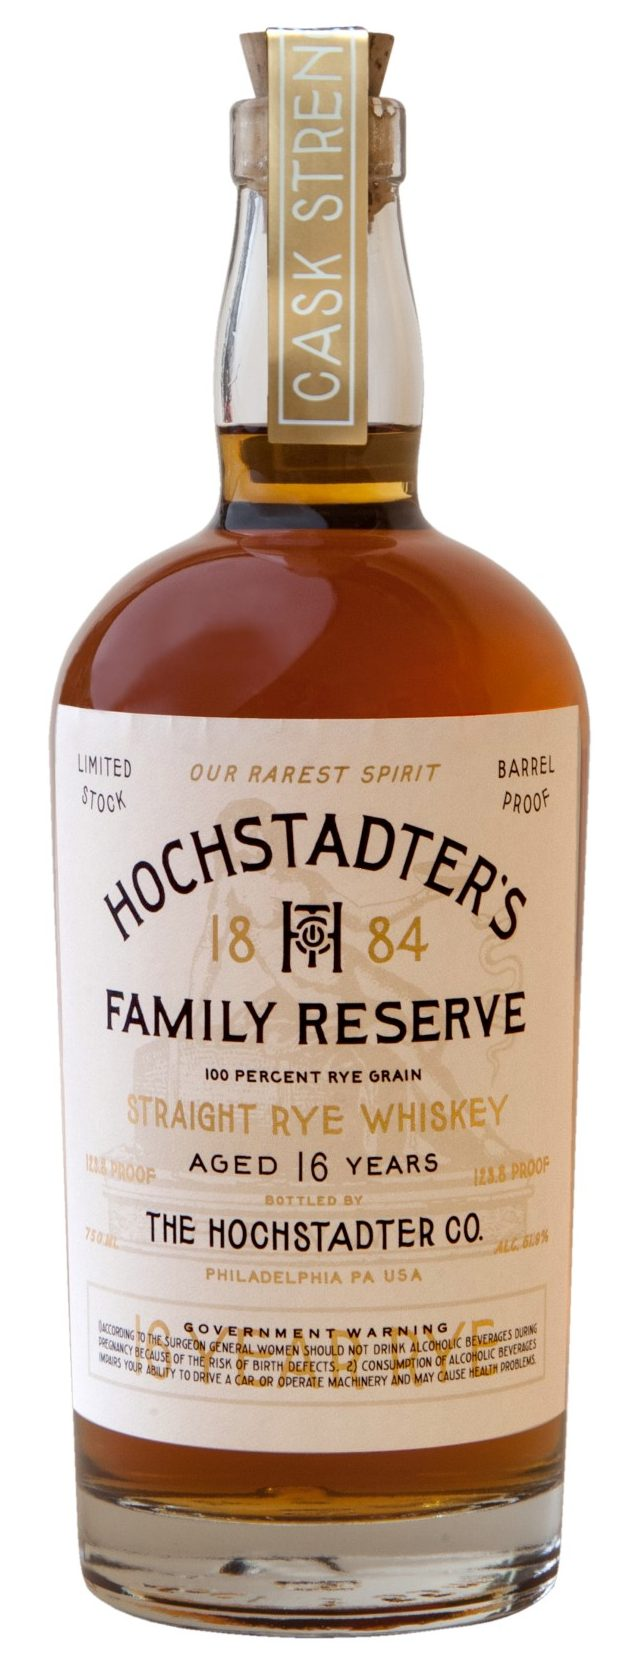 Hochstadter's Family Reserve Straight Rye Whiskey 16 Years Old